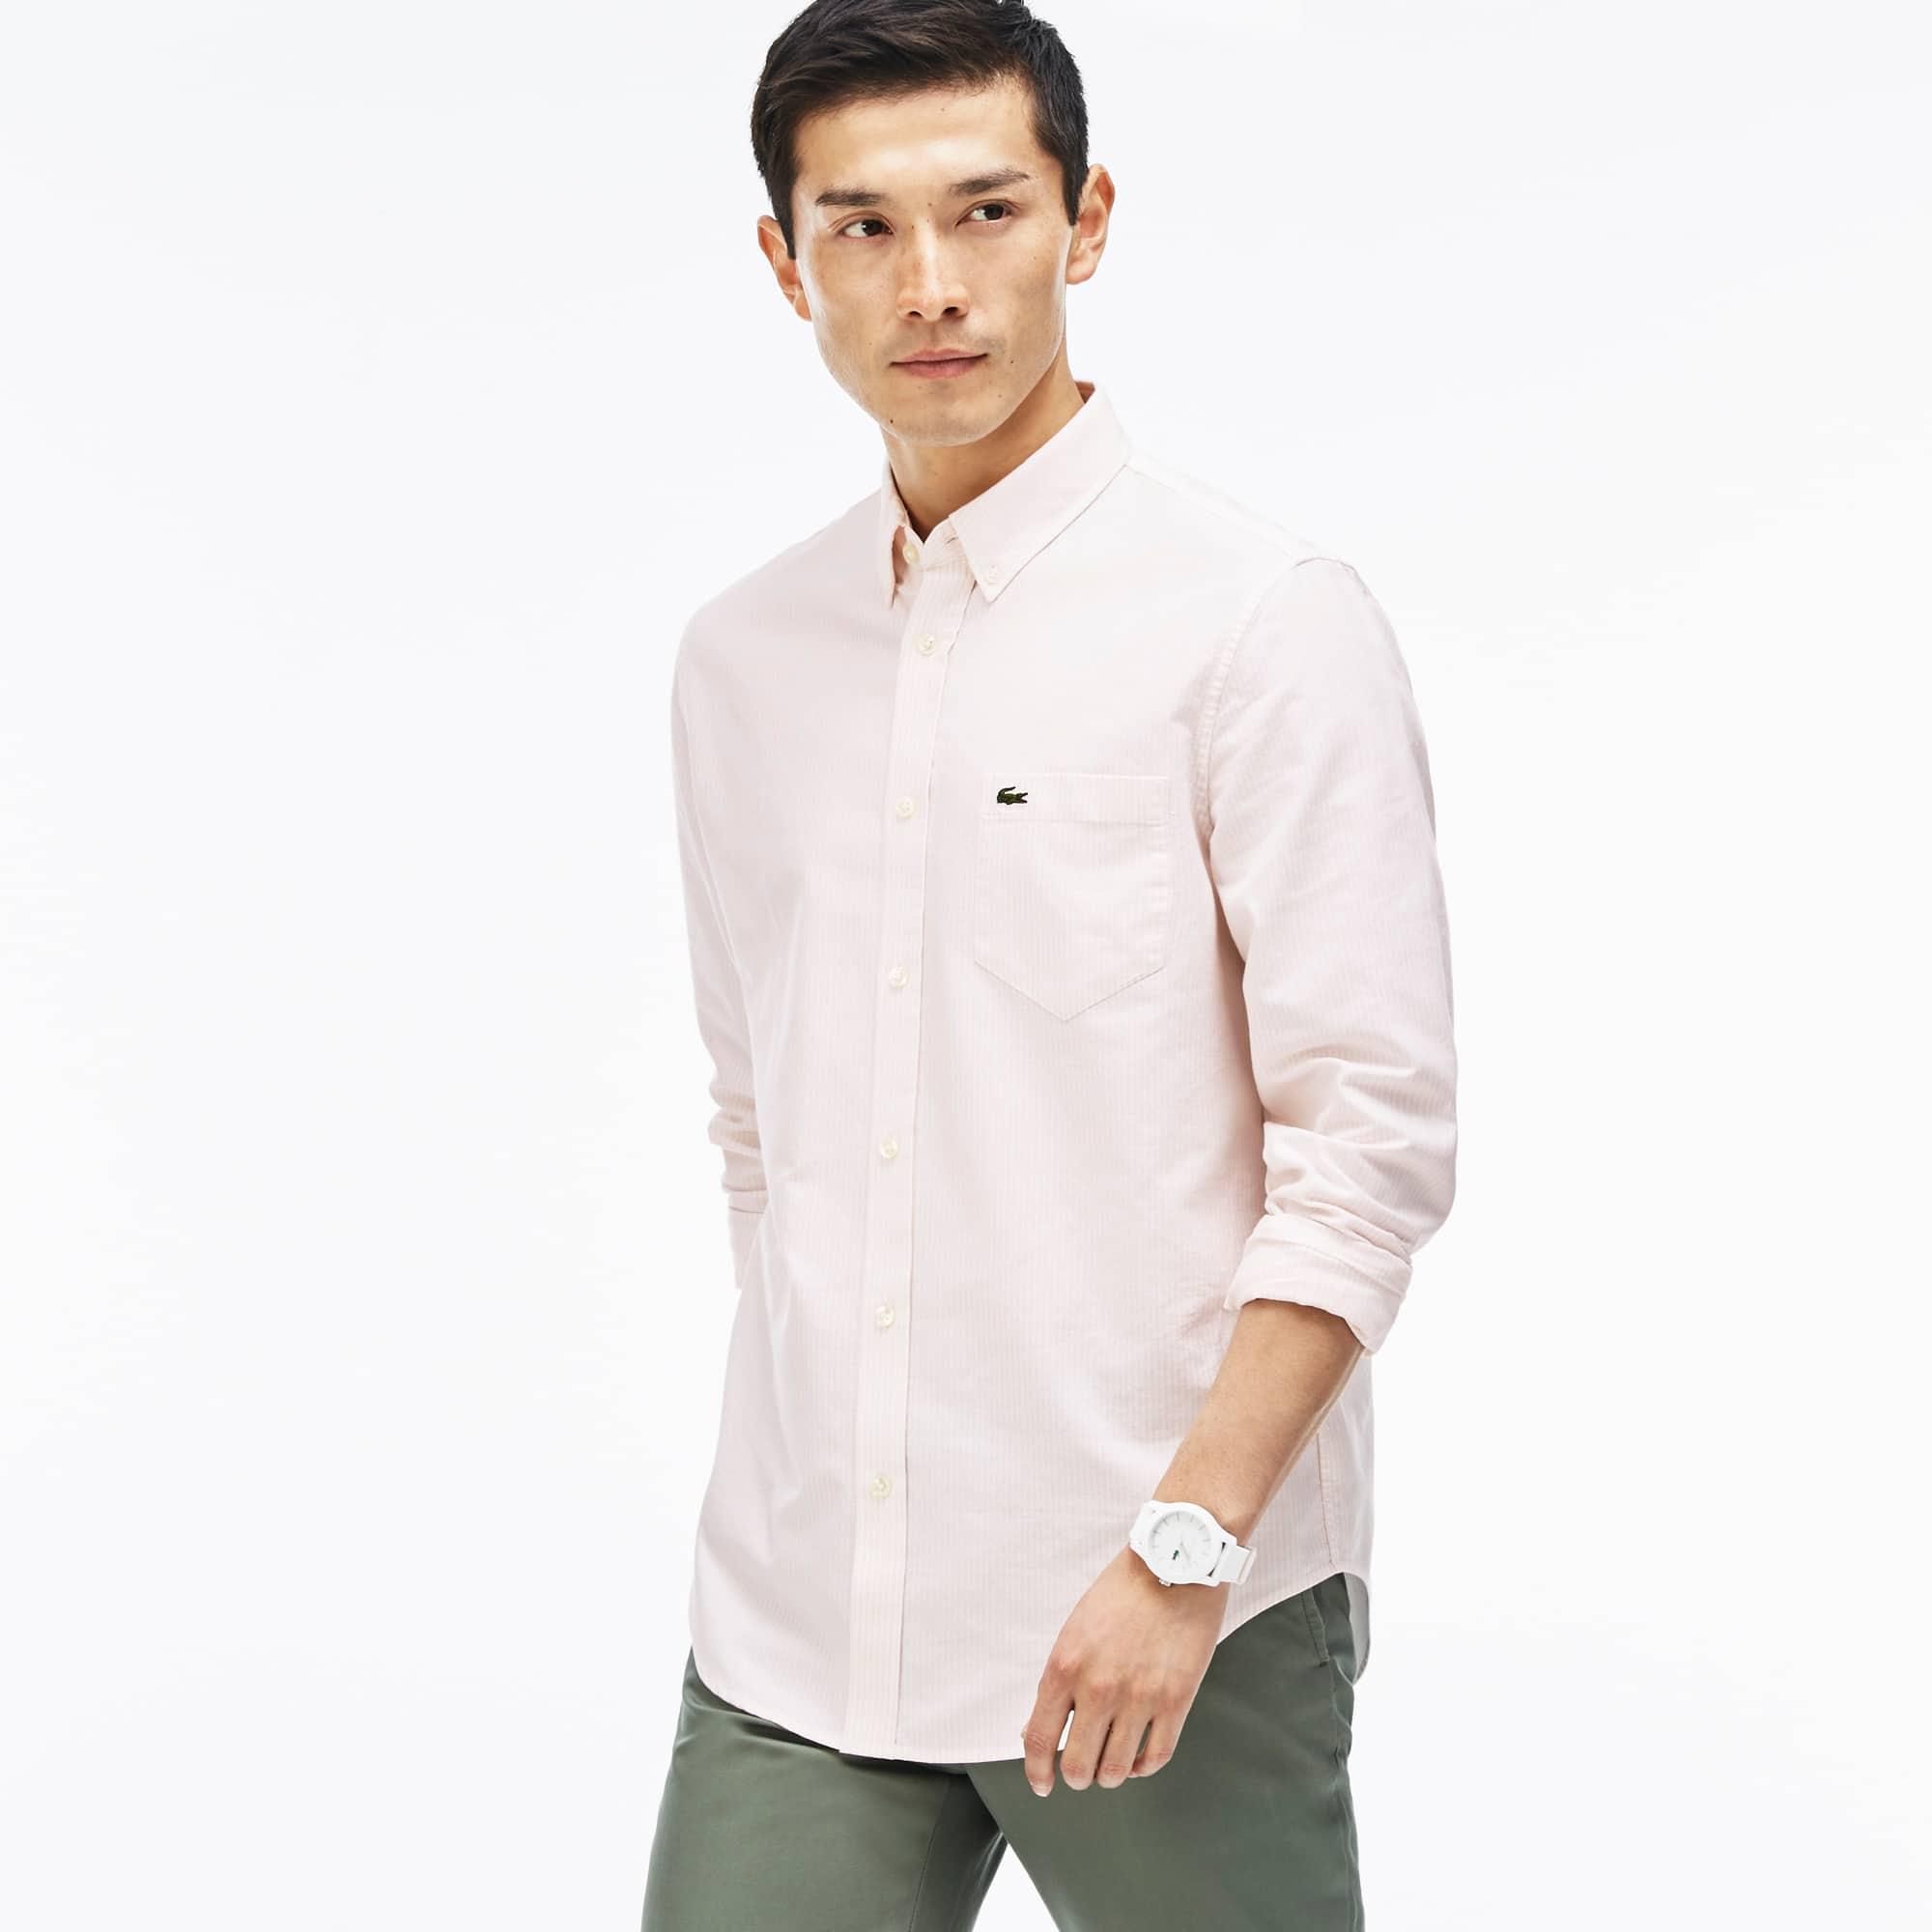 Men's Regular Fit Oxford Cotton Striped Shirt